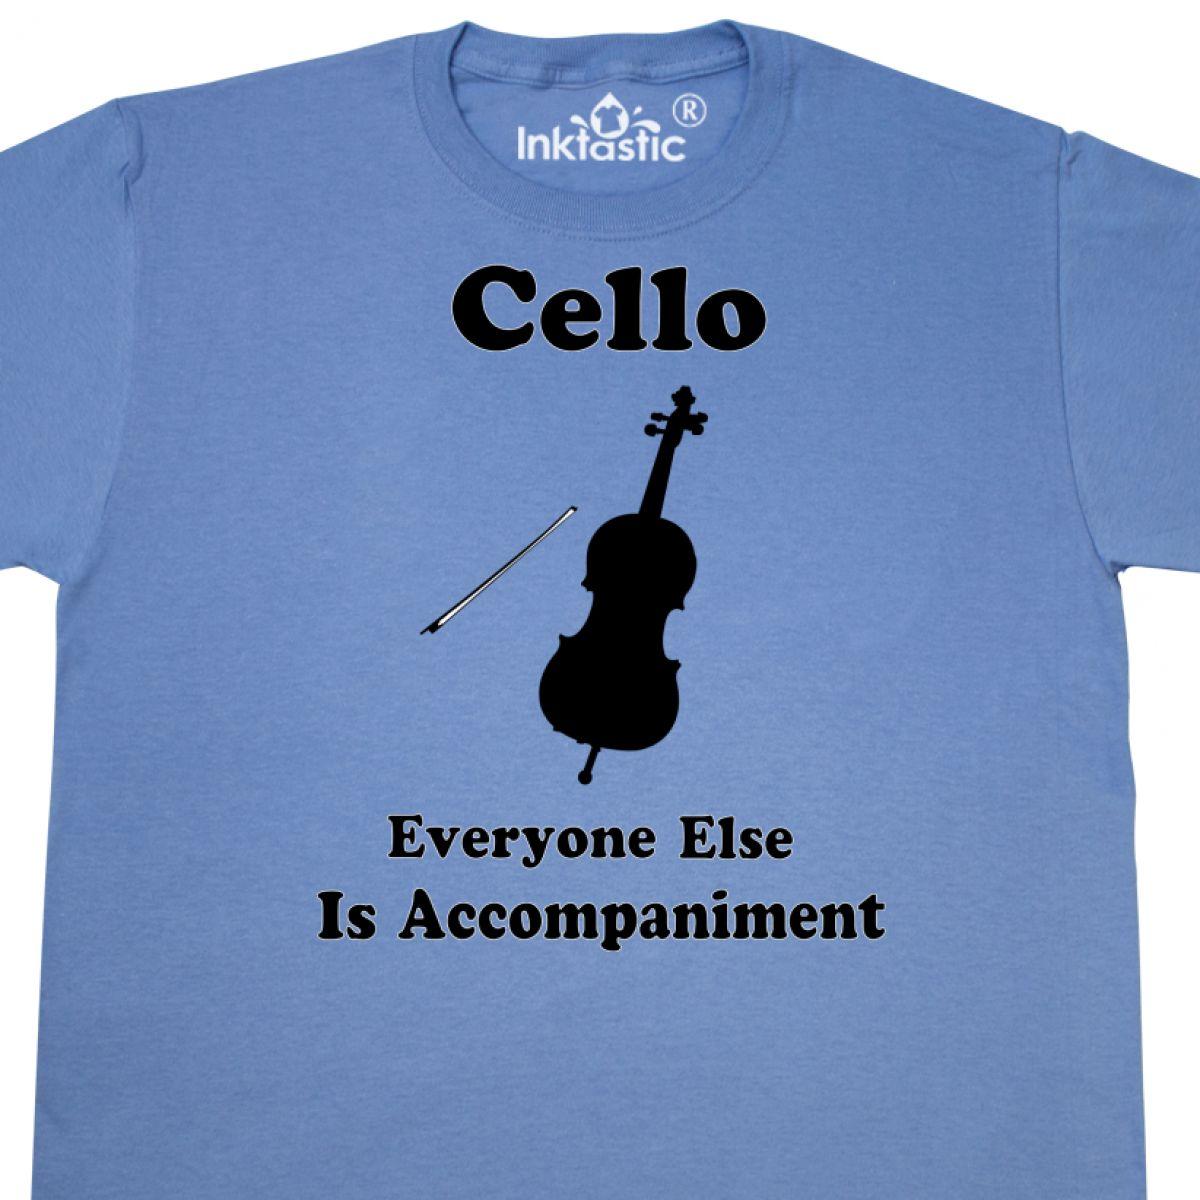 6c9519271 Inktastic Funny Cello Player Music Joke T-Shirt Gift Idea Strings ...